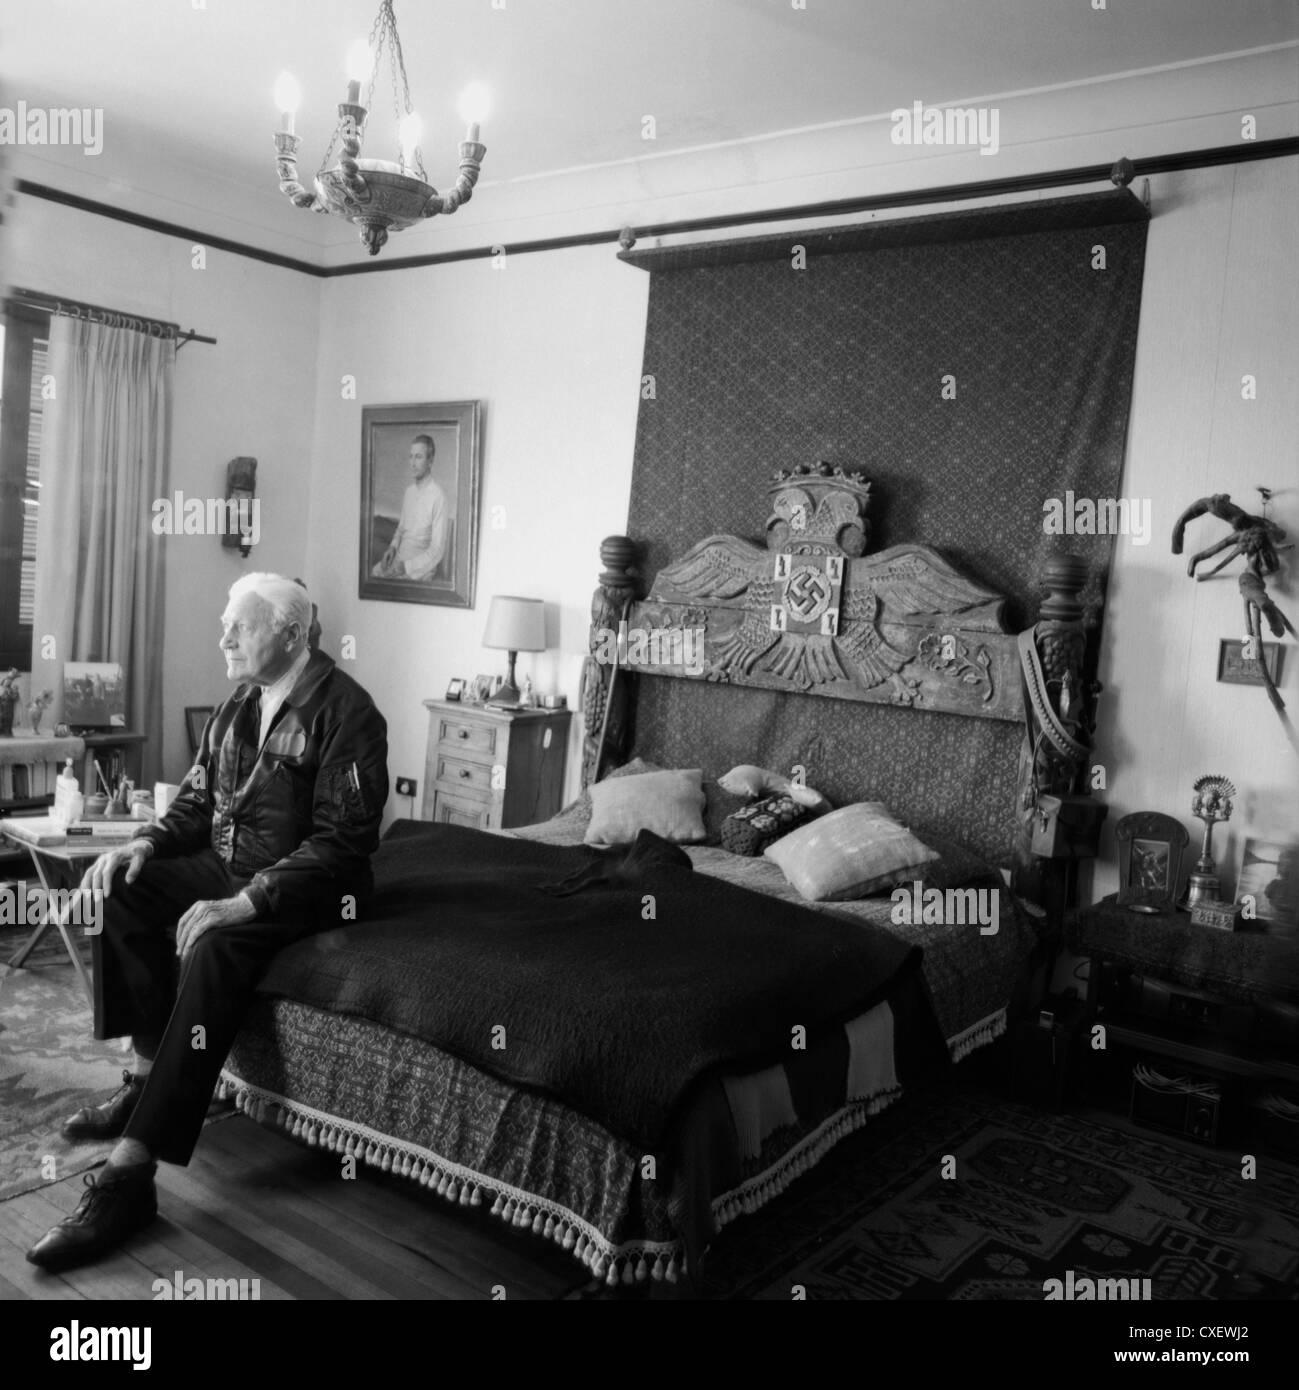 Writer and Nazi follower Miguel Serrano - Stock Image